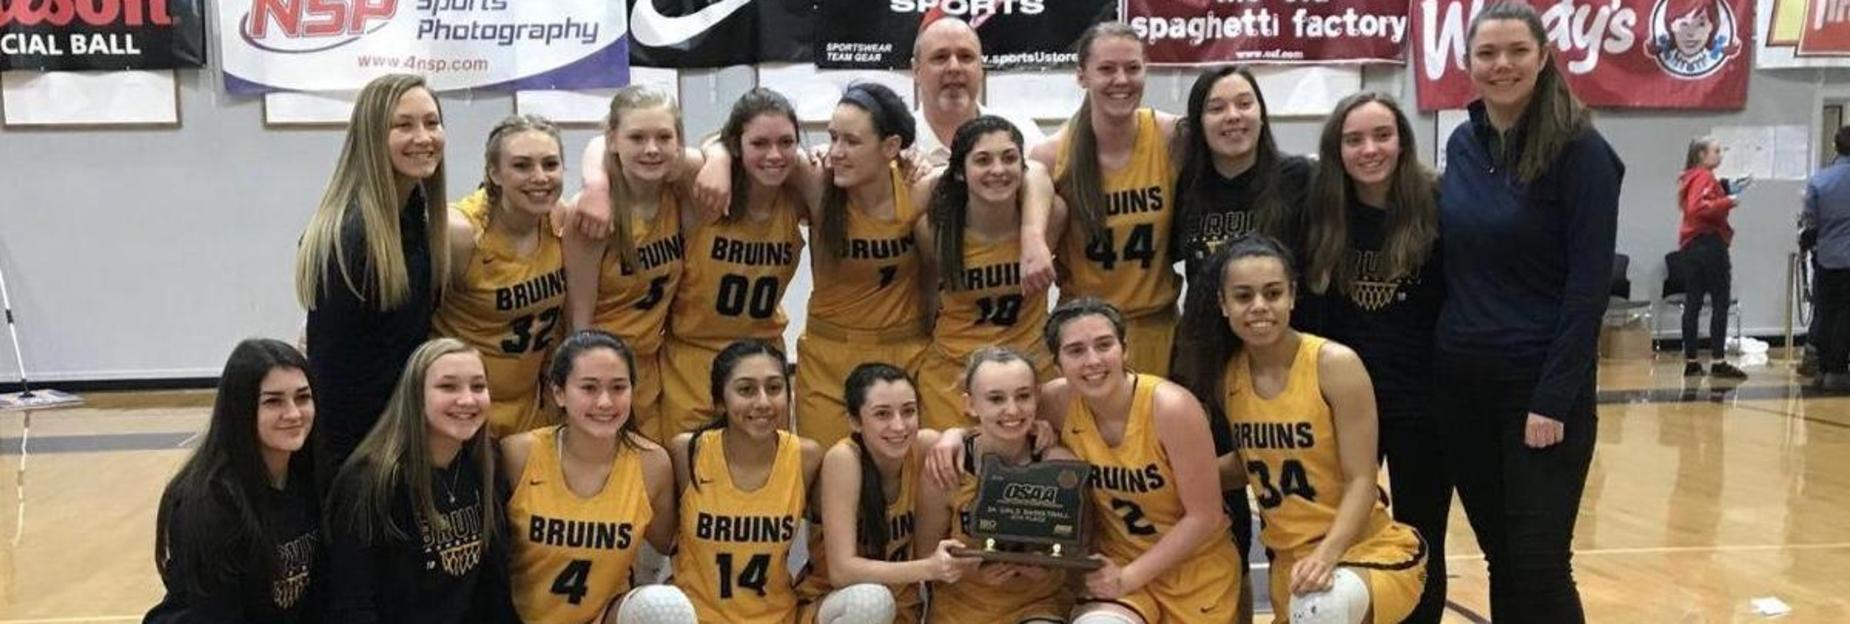 BHHS Bruin Basketball